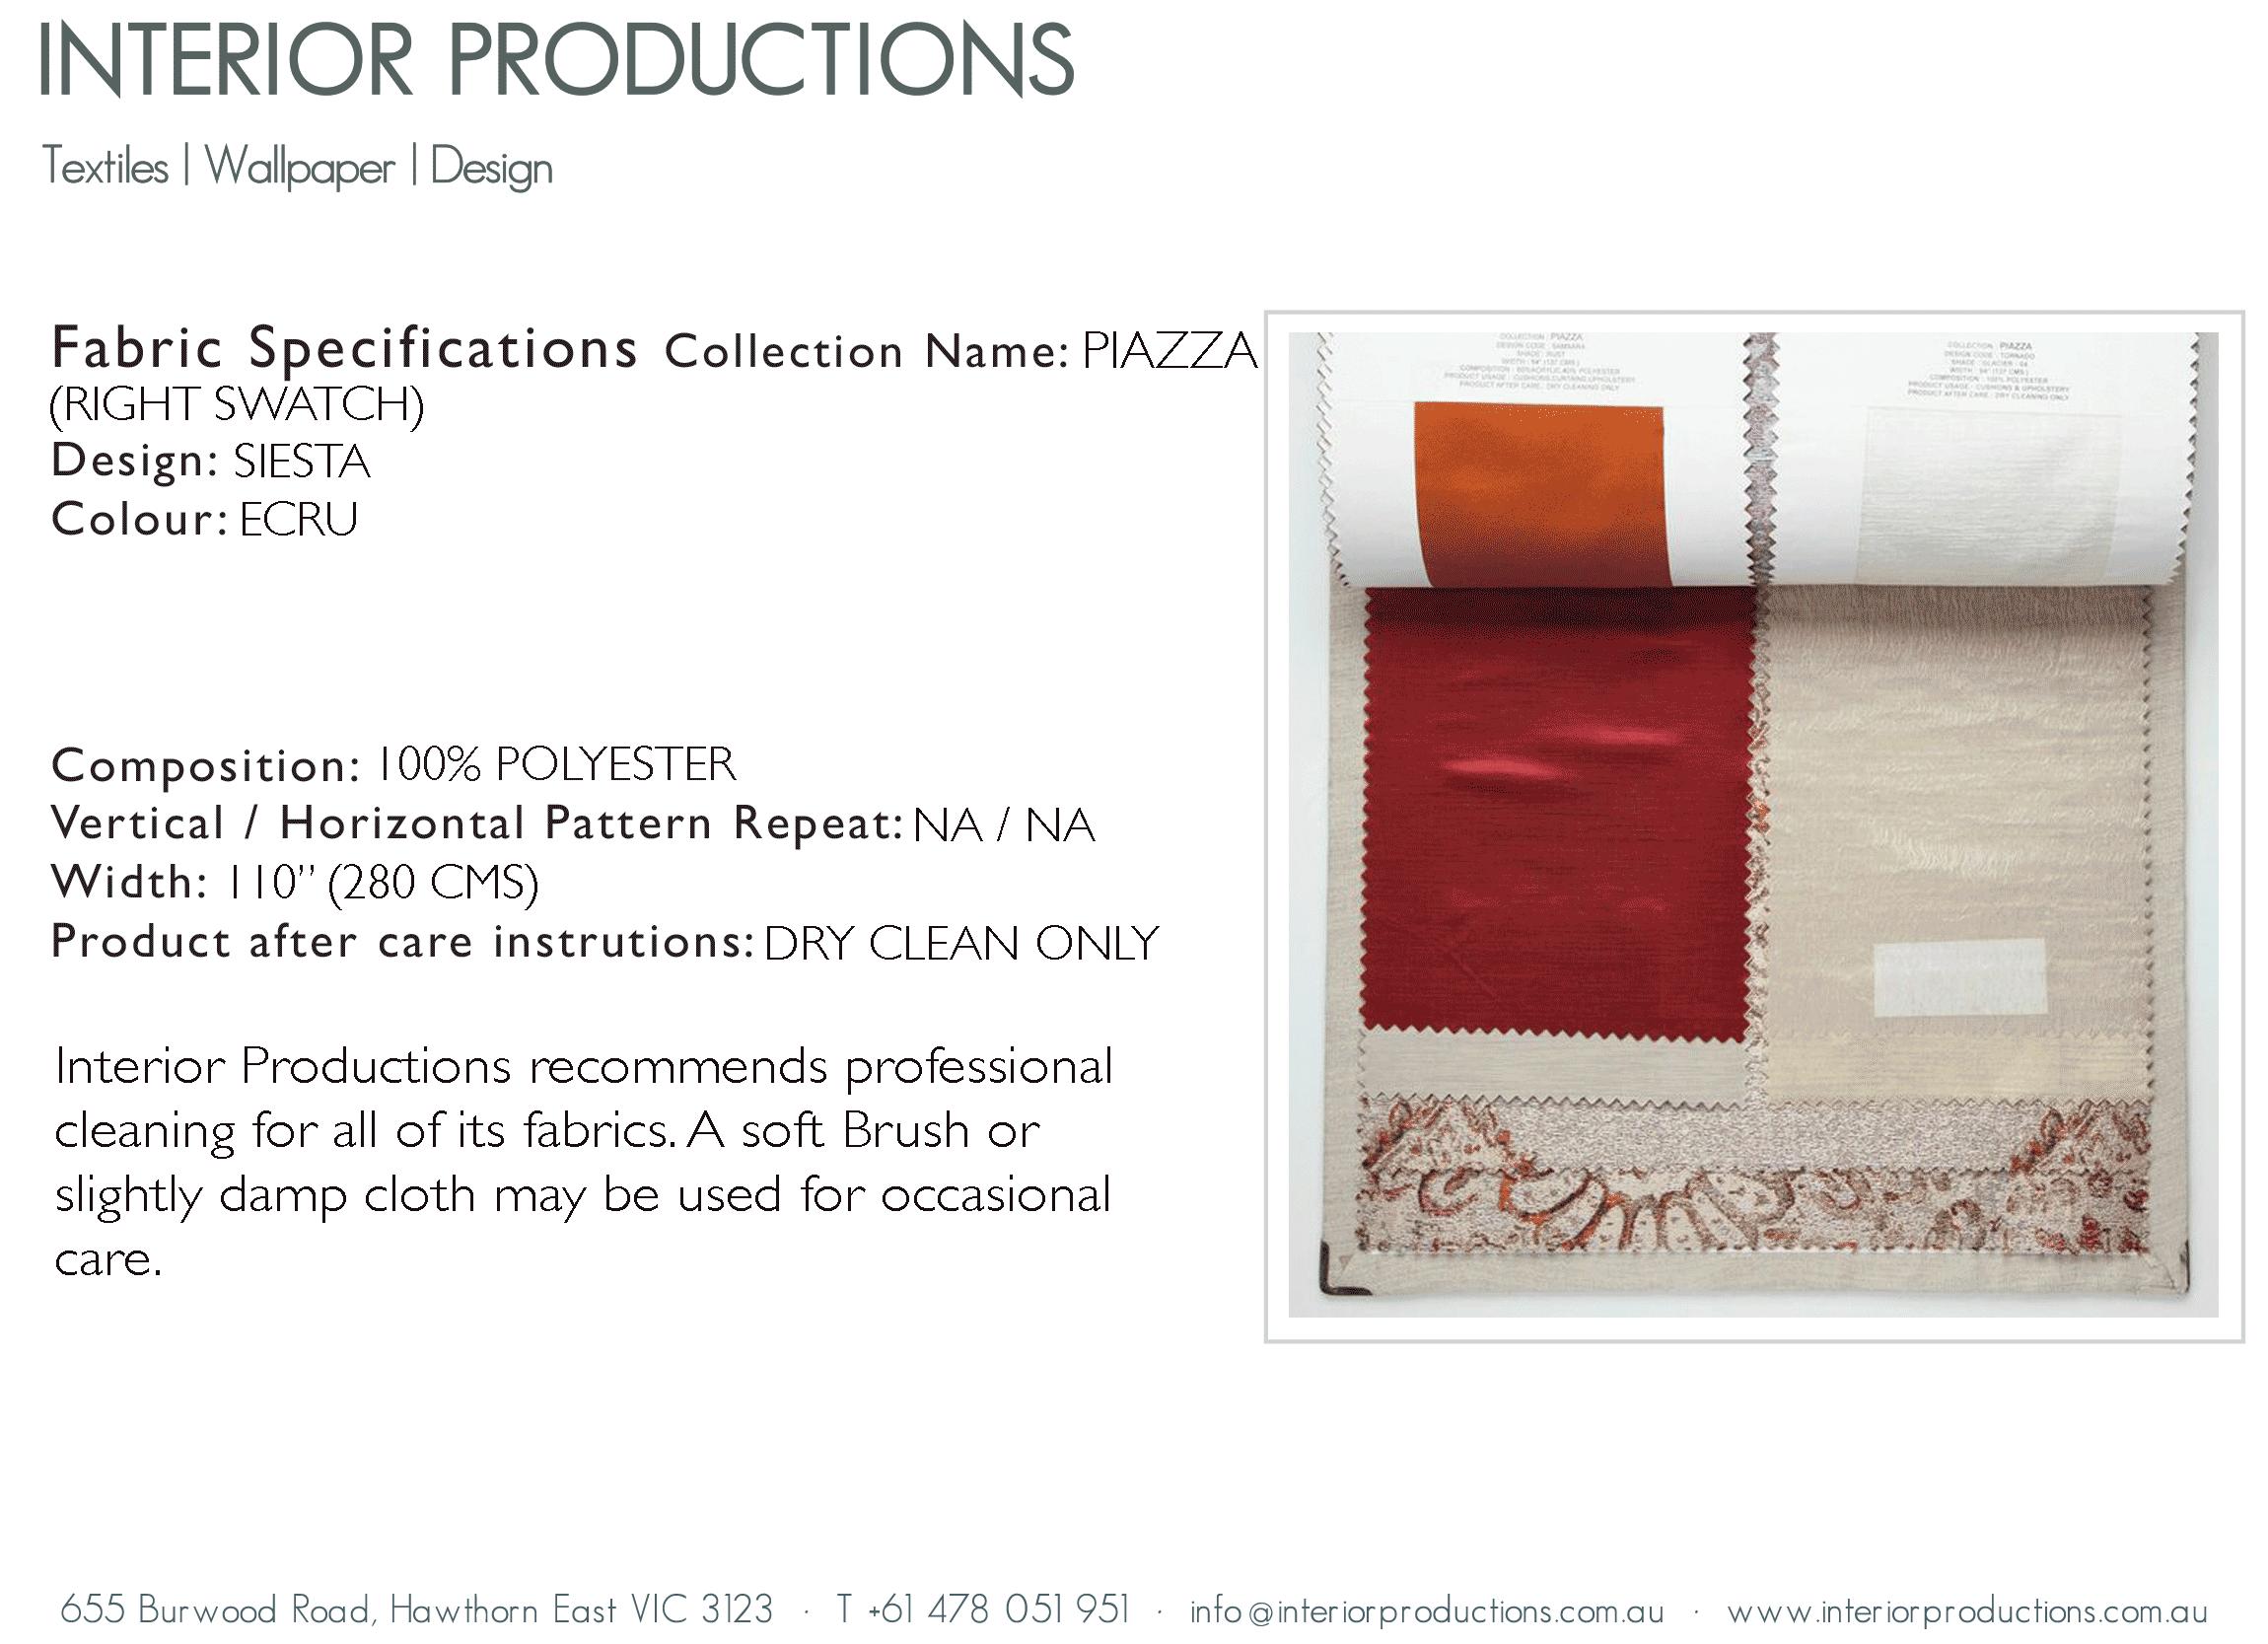 interior_productions_SIESTA---ECRU